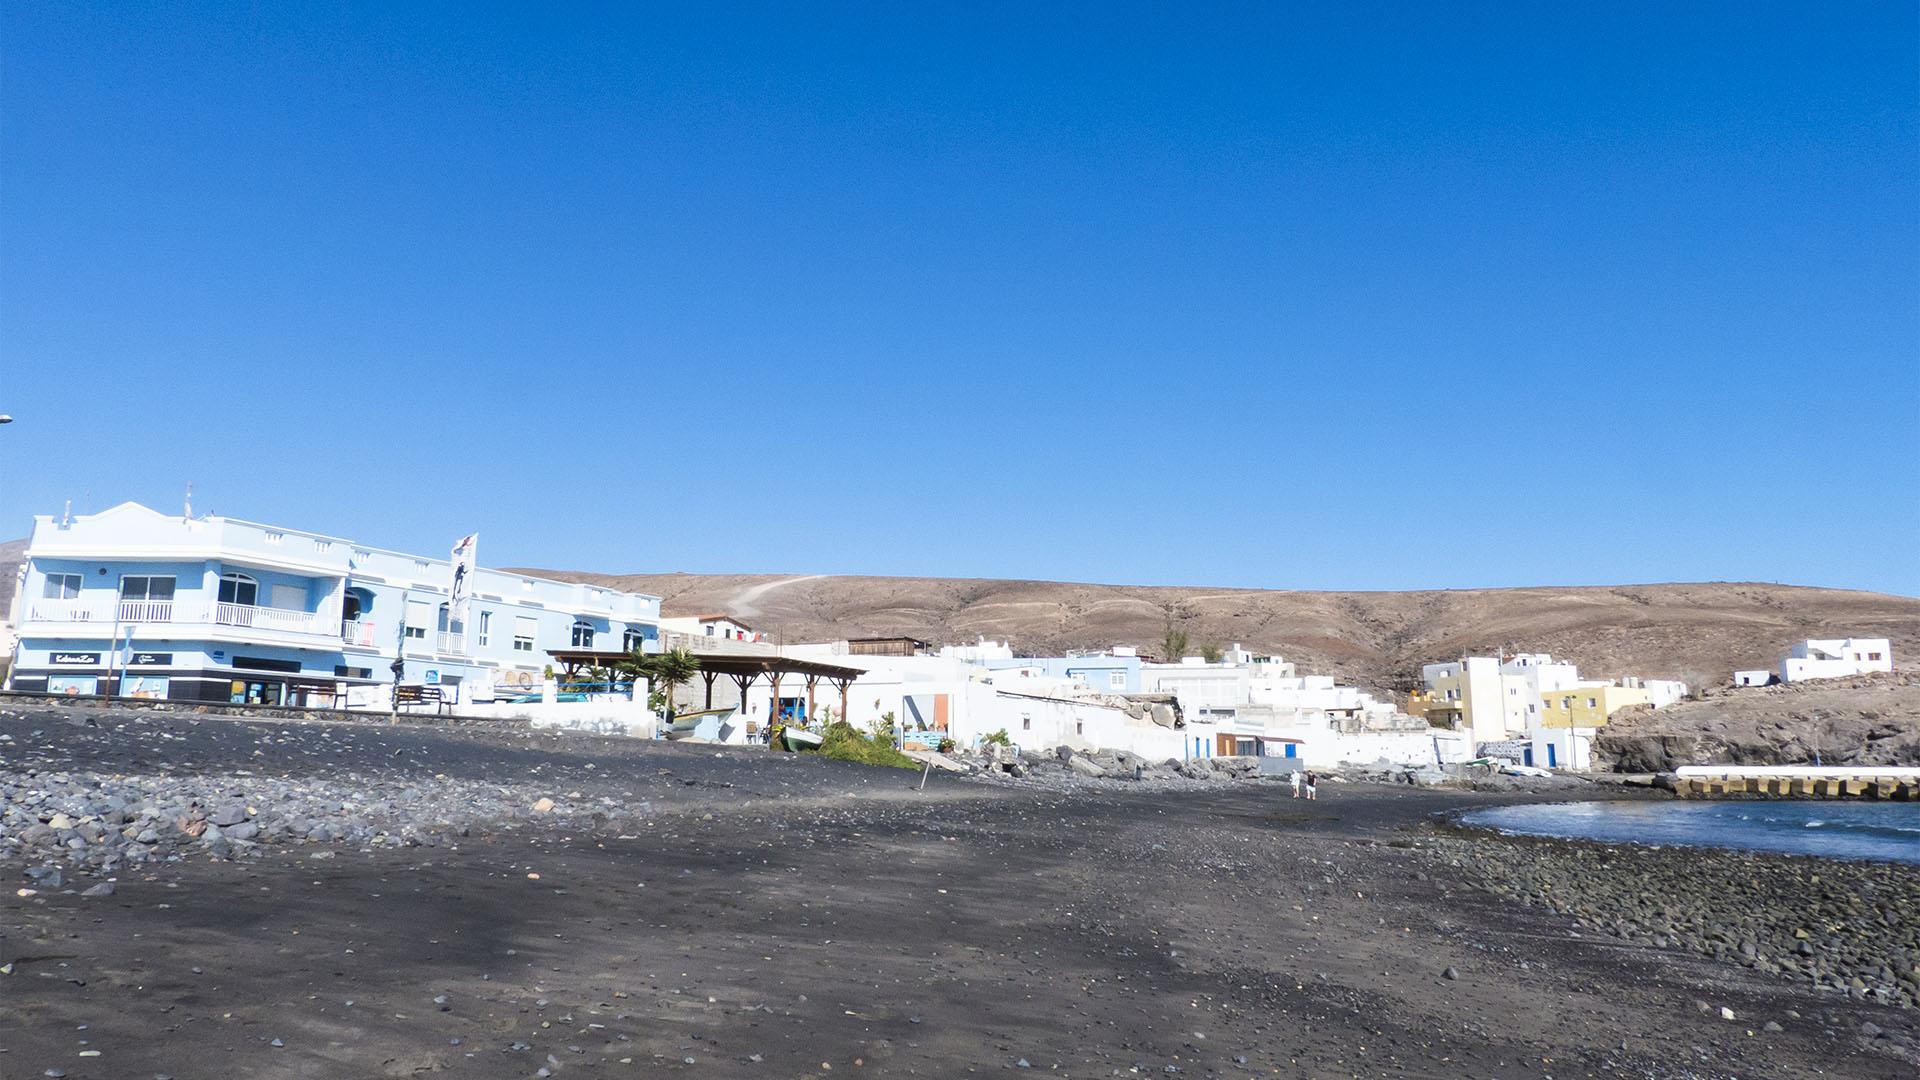 vDie Strände Fuerteventuras: Playa de Tarajalejo.